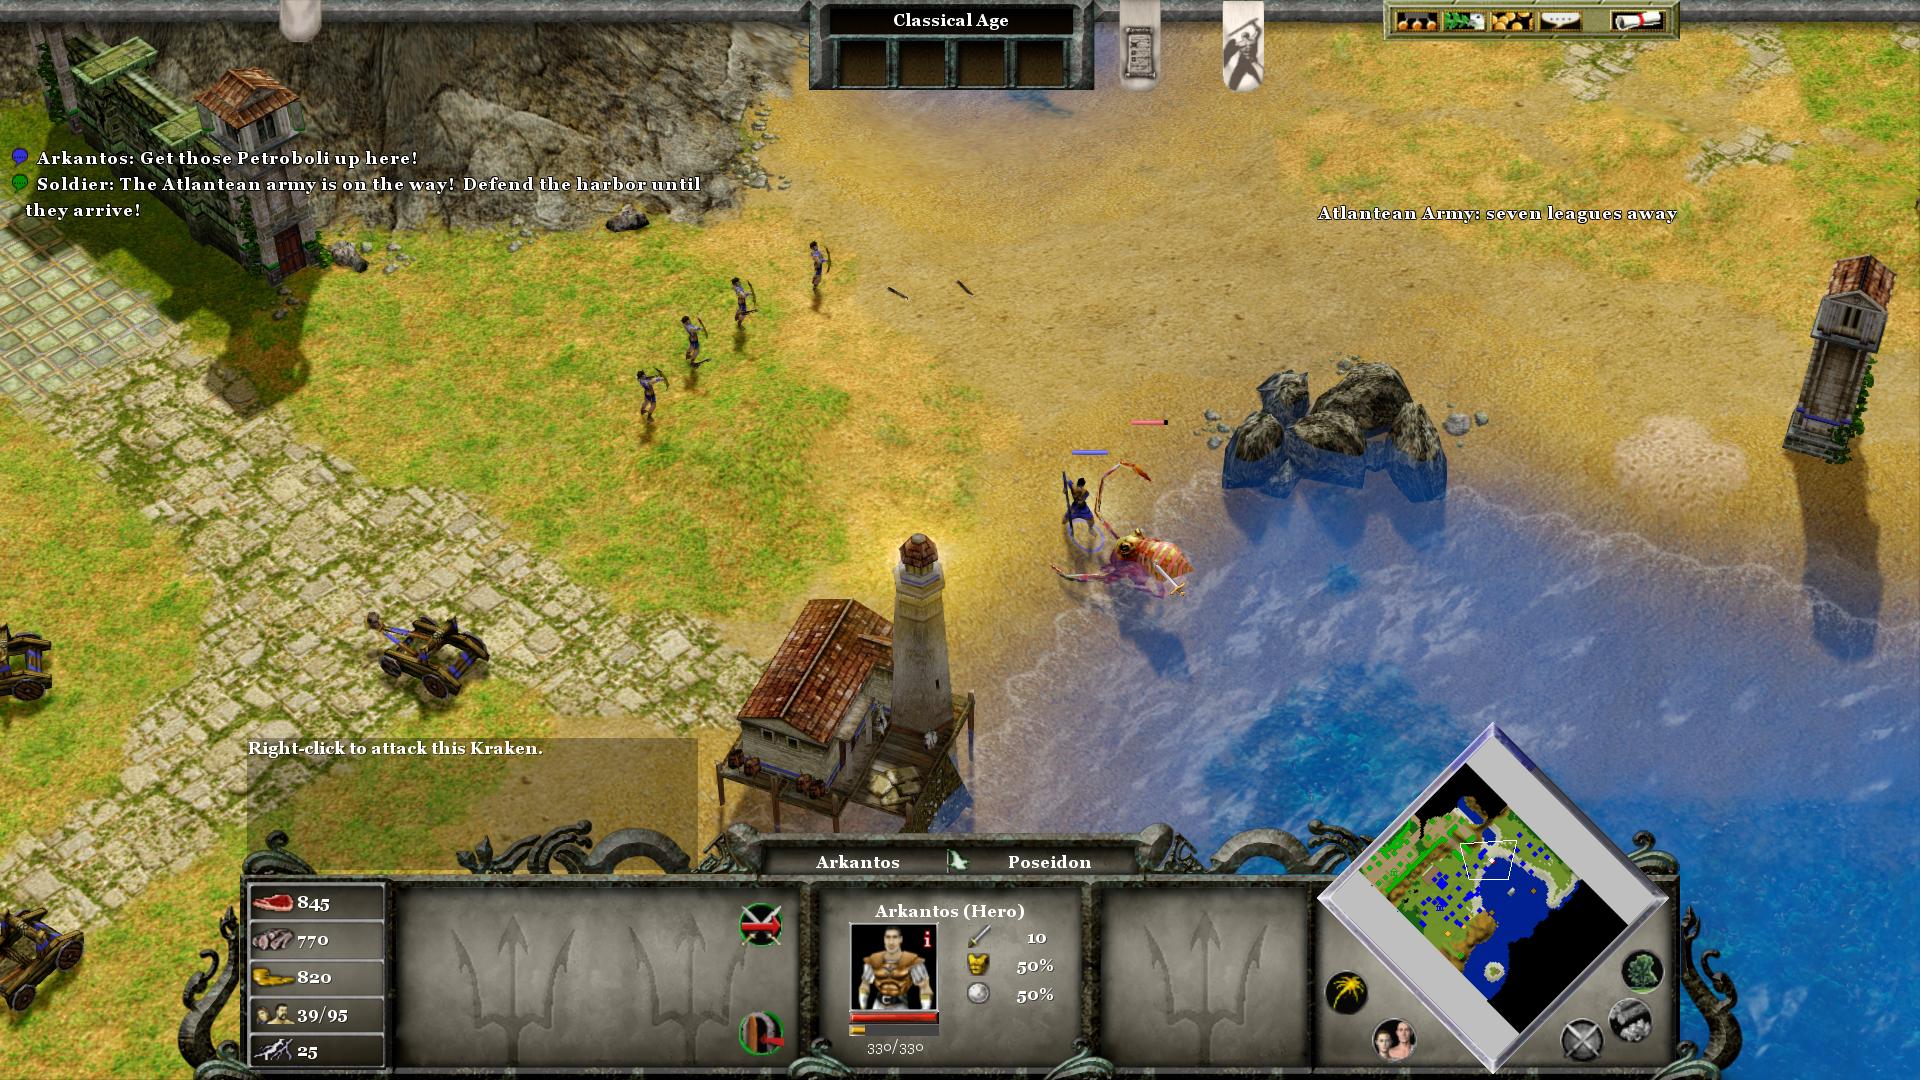 694636-age-of-mythology-extended-edition-windows-screenshot-arkantos